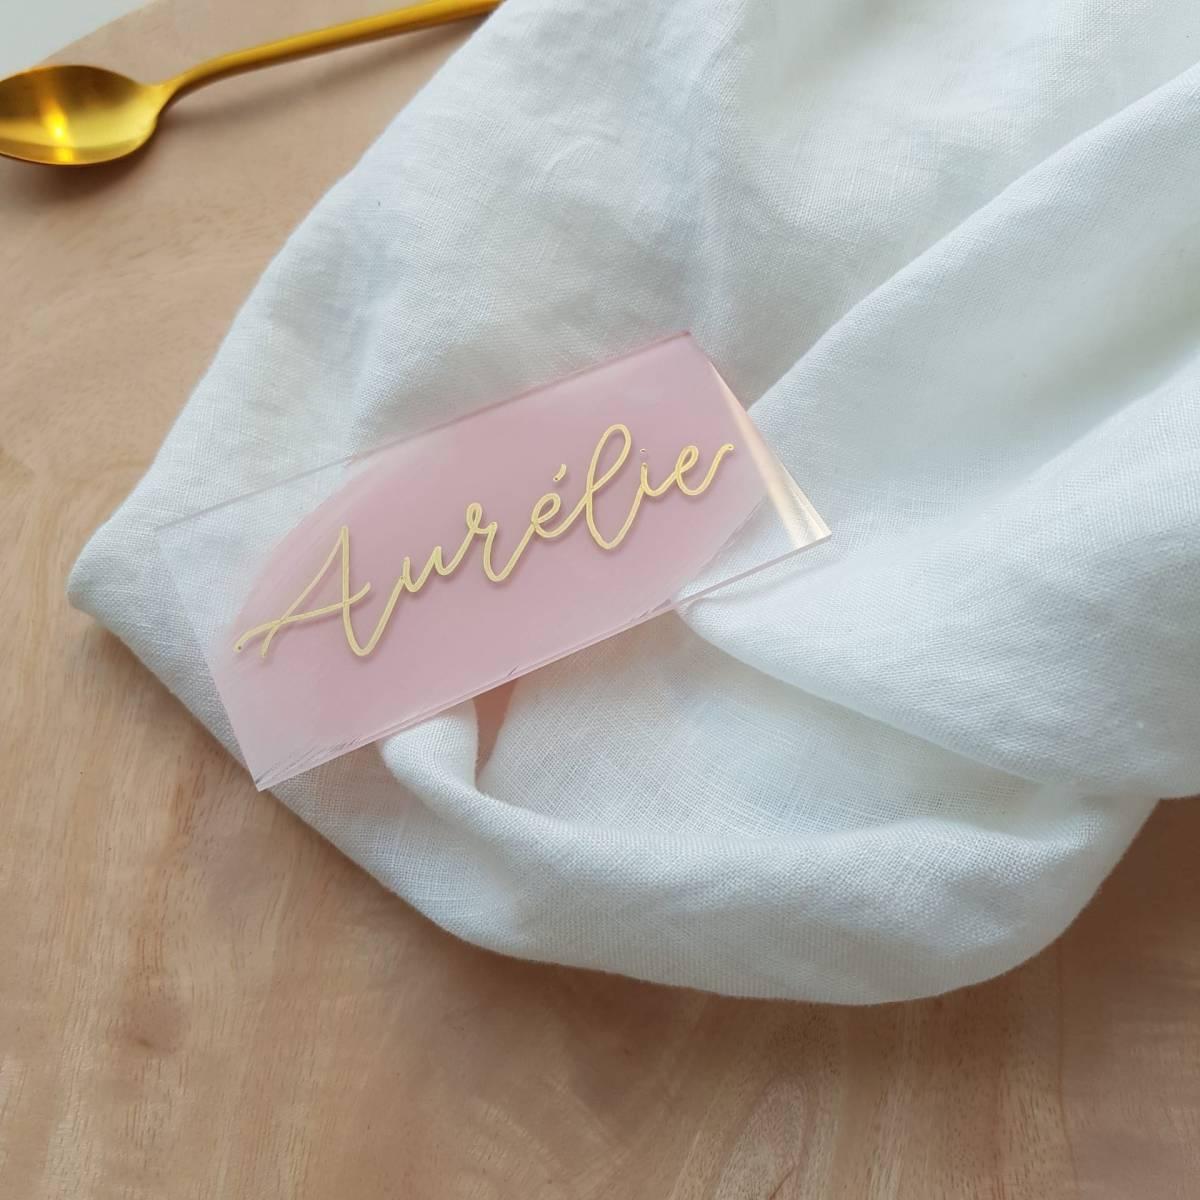 Touch of Gold - Workshops - Vrijgezellen - Trouwuitnodiging - Huwelijksuitnodiging - Kalligrafie - House of Weddings - 1